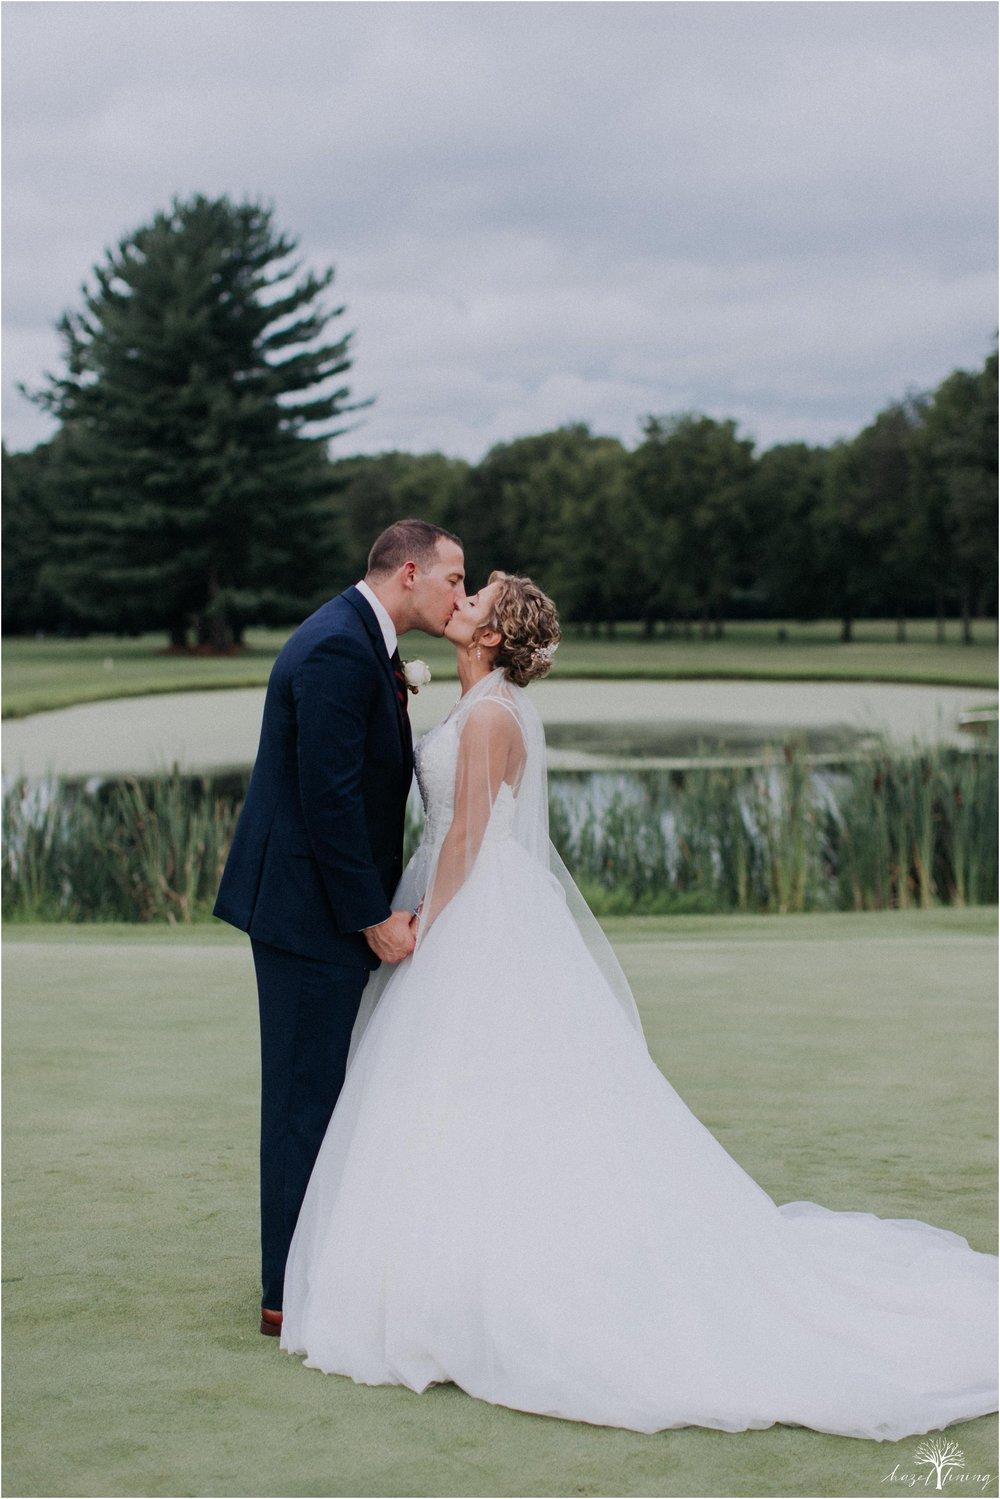 jonathan-weibel-becky-haywood-loft-at-sweetwater-cc-pennsburg-pennsylvania-rainy-day-summer-wedding-hazel-lining-travel-wedding-elopement-photography_0079.jpg